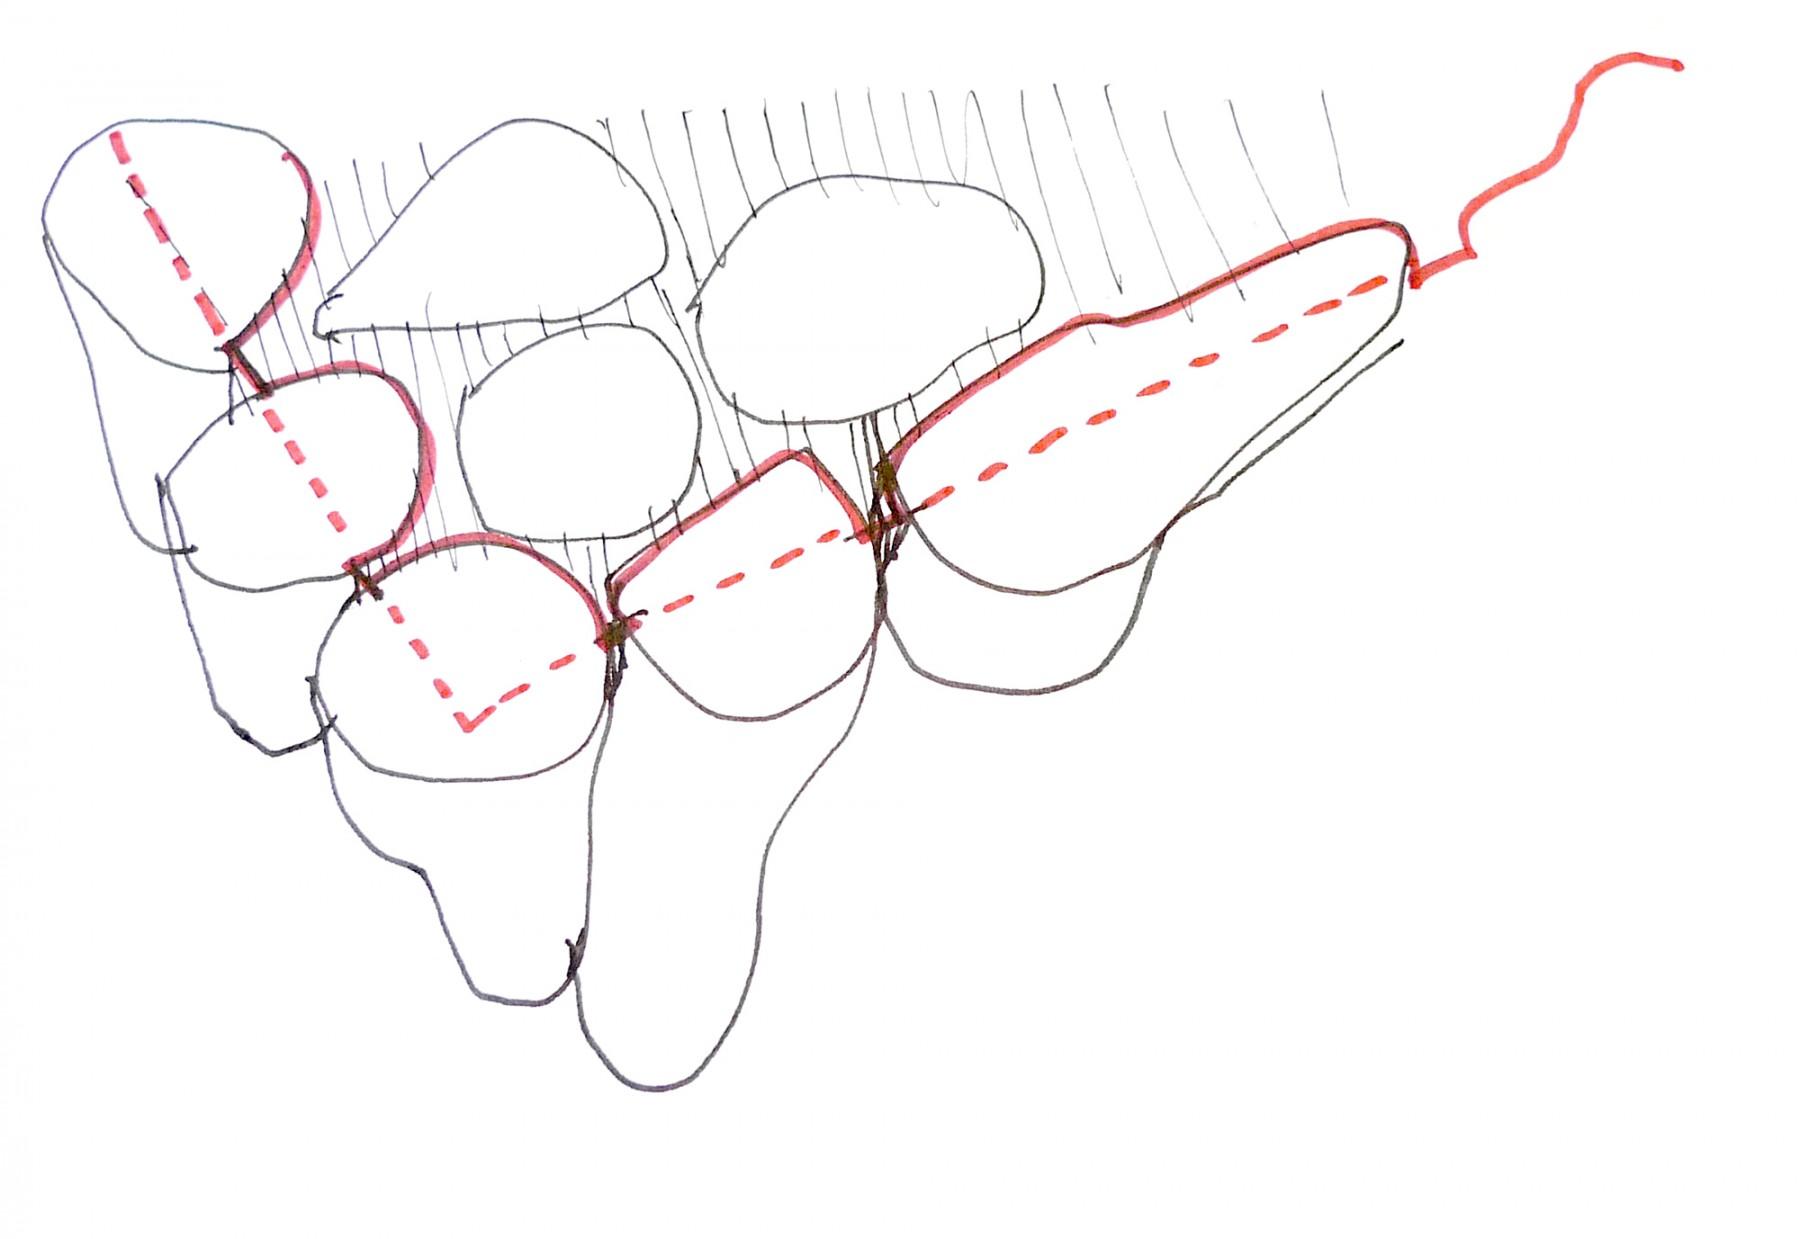 Selfridges-London-designer-fashion-retail-Jamie-Fobert-Architects-shop-shoe-last-table-galleries-sketches